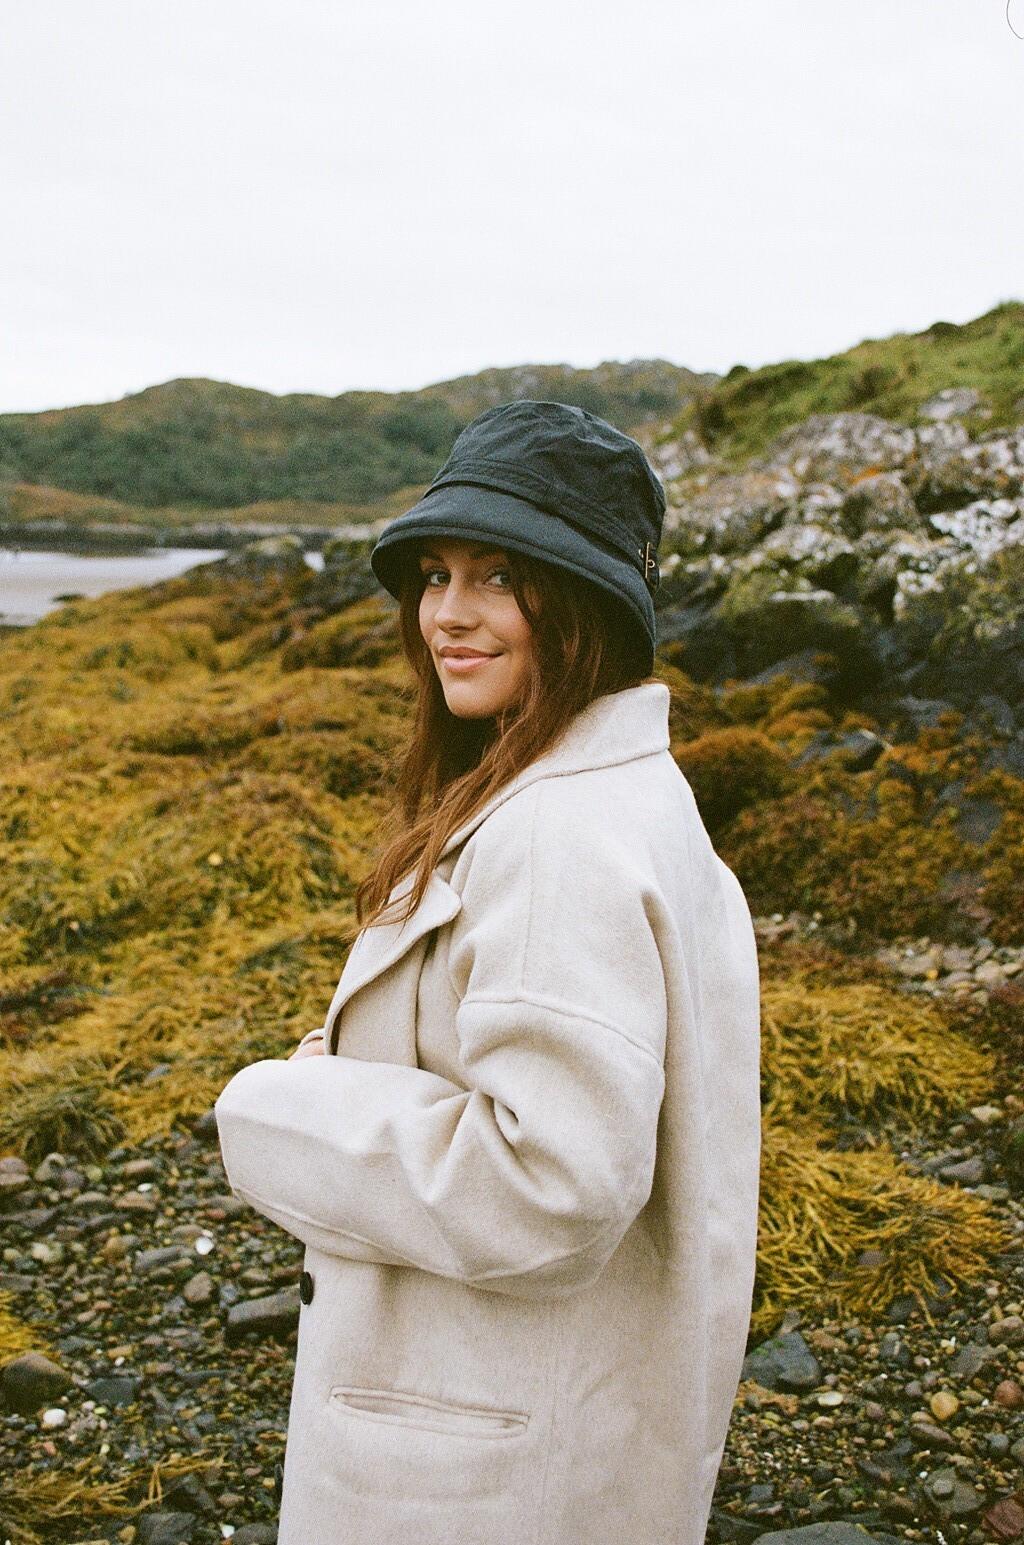 The Little Magpie Scotland Photo Diary North Coast 500 11